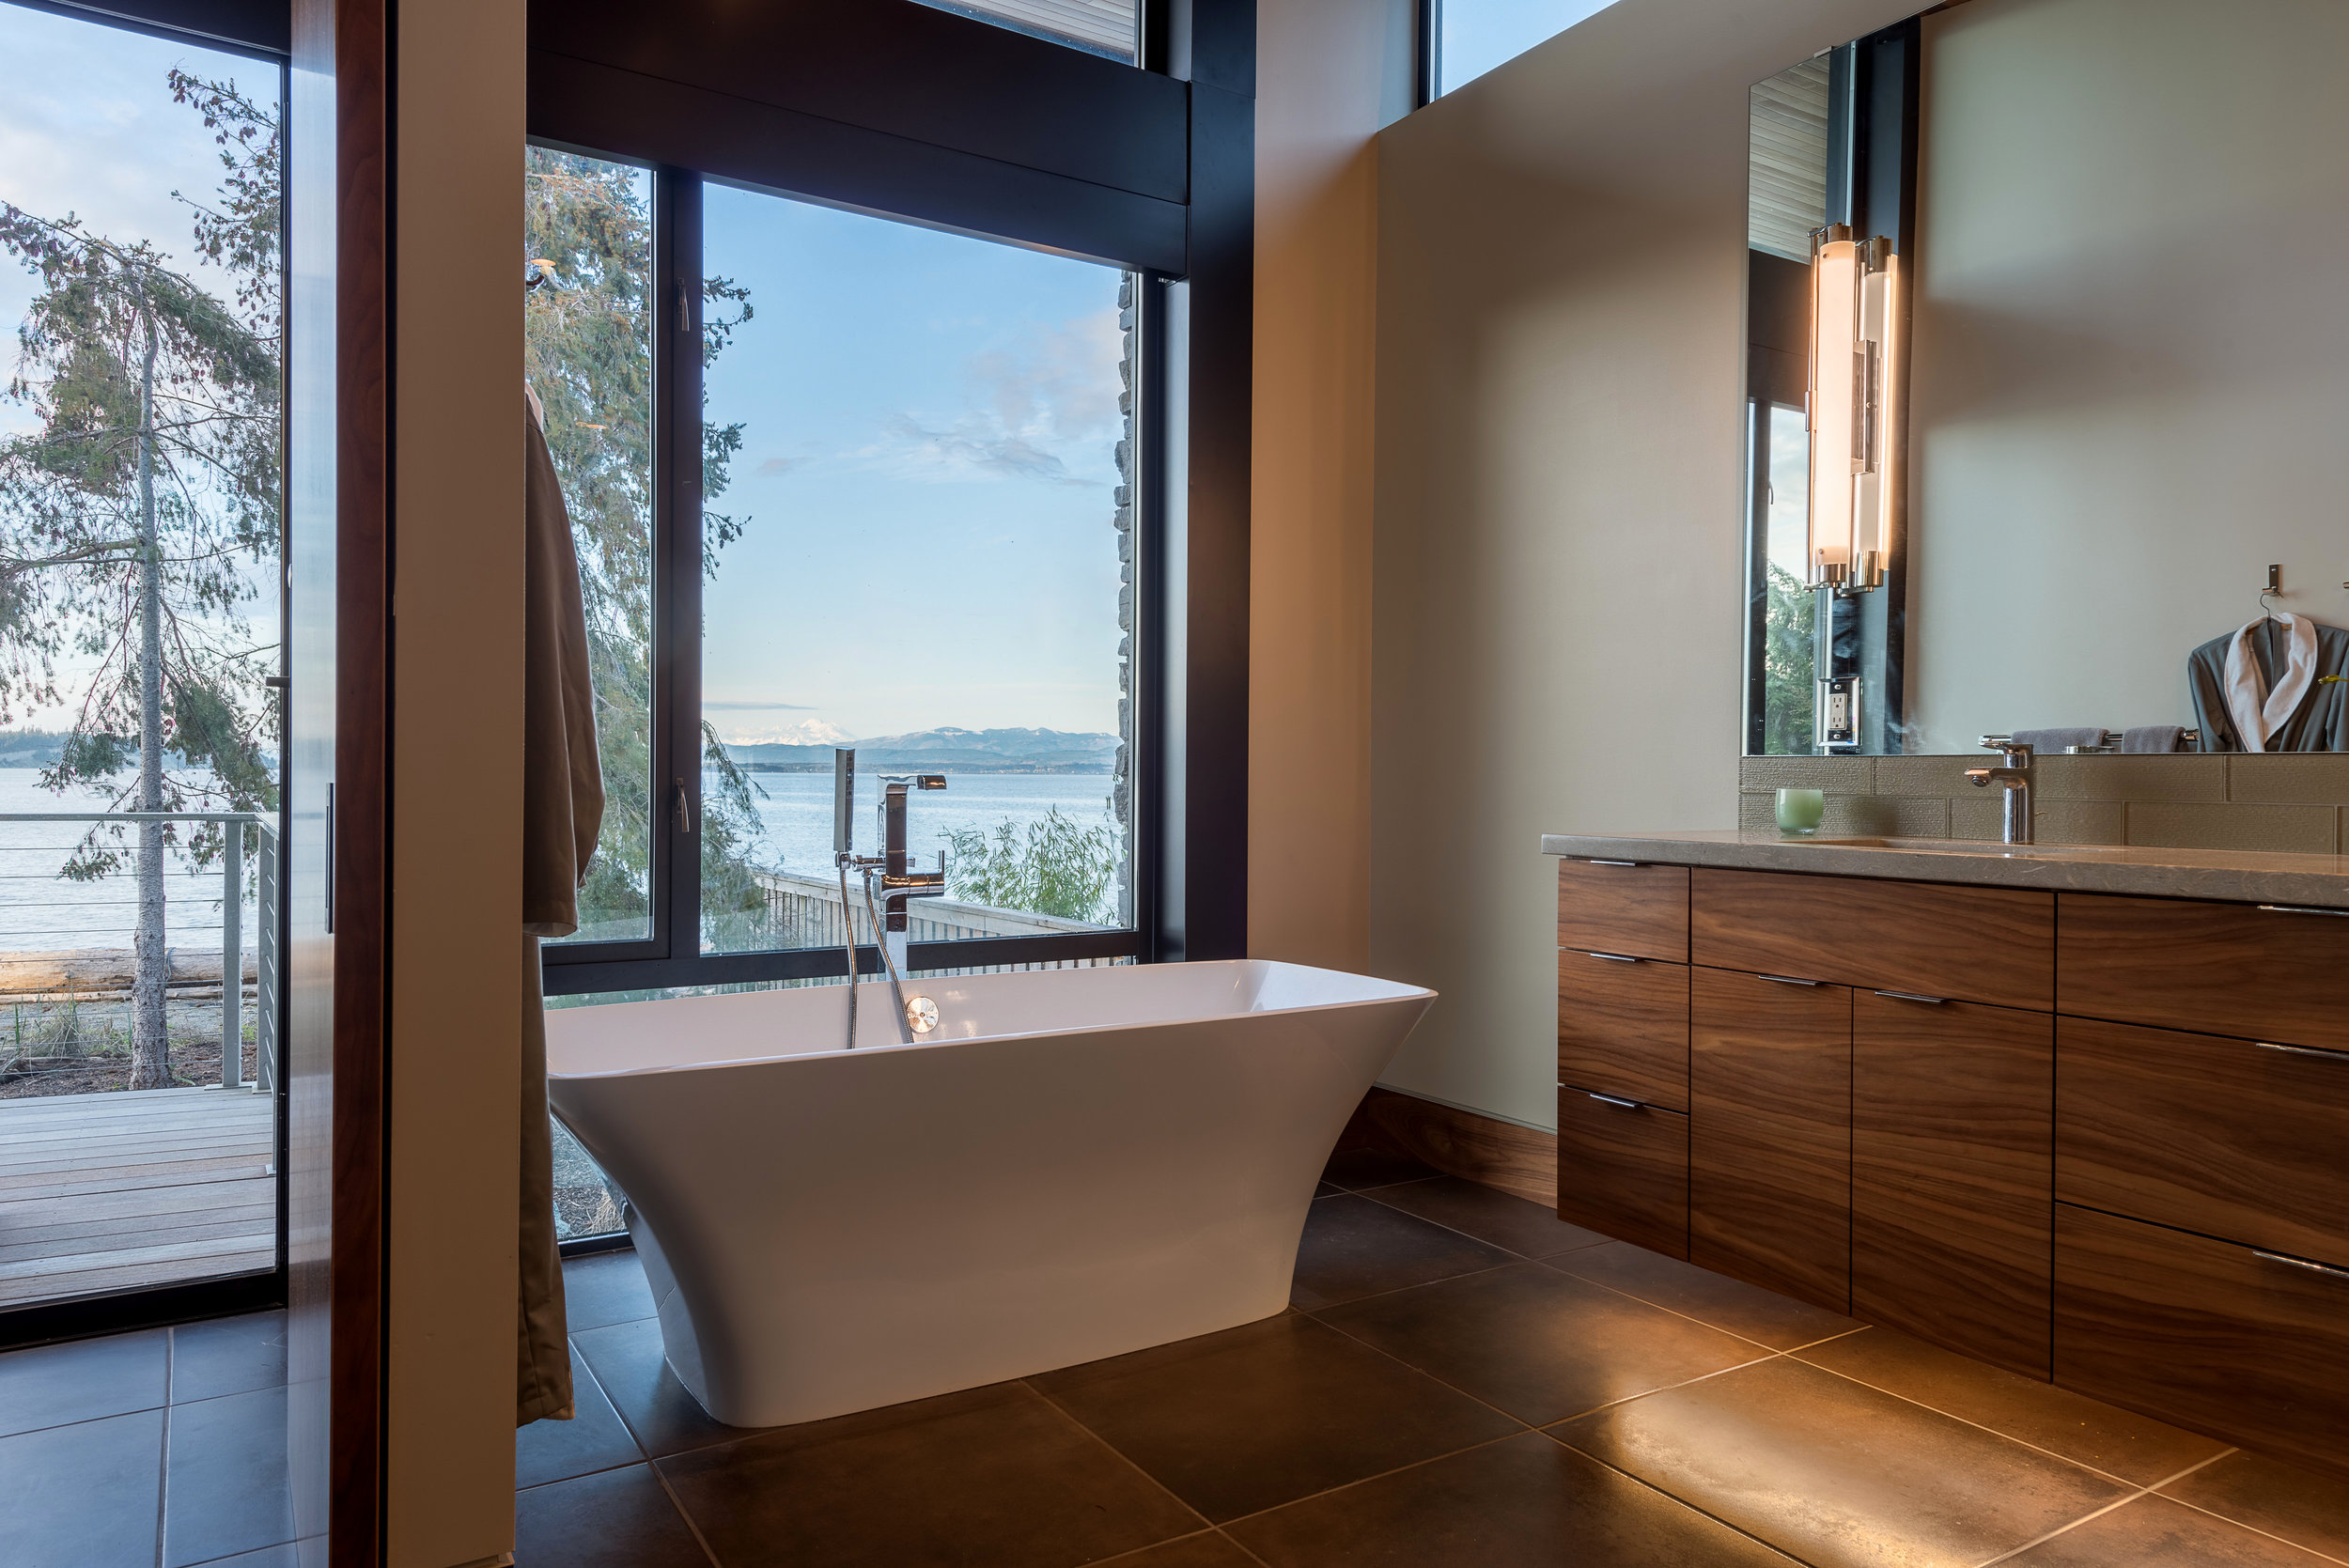 17 - Camano Beach Drive House 5000px - Swift Studio.jpg